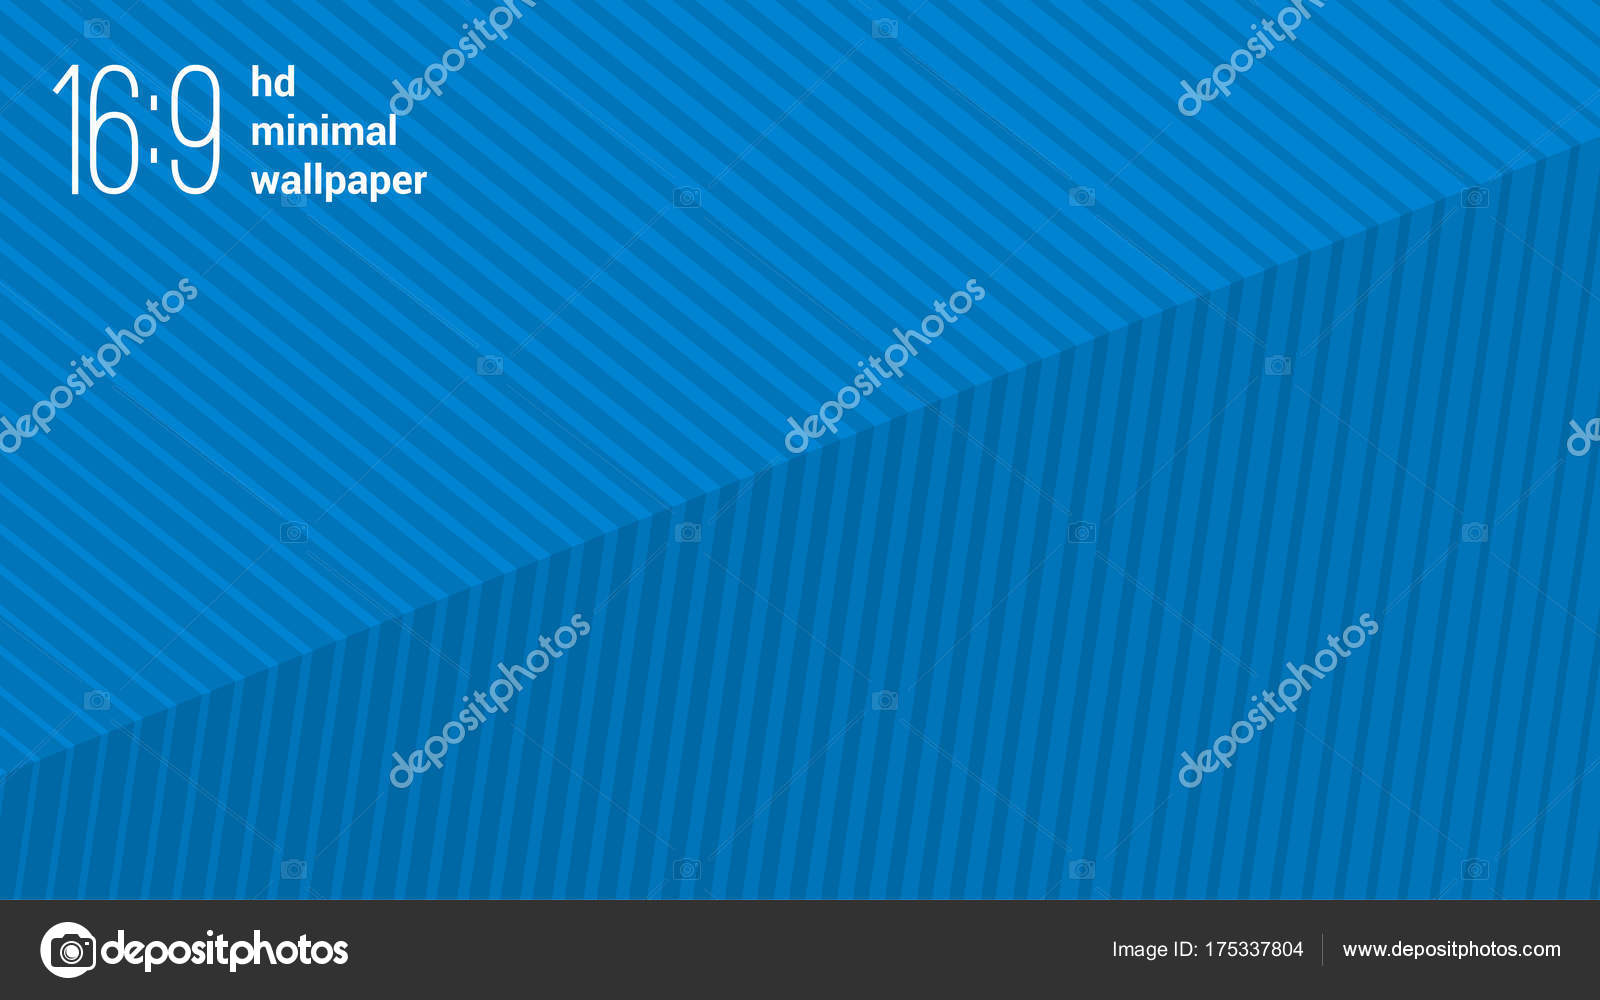 Minimal Wallpaper Hd Minimalist Wallpaper Vector